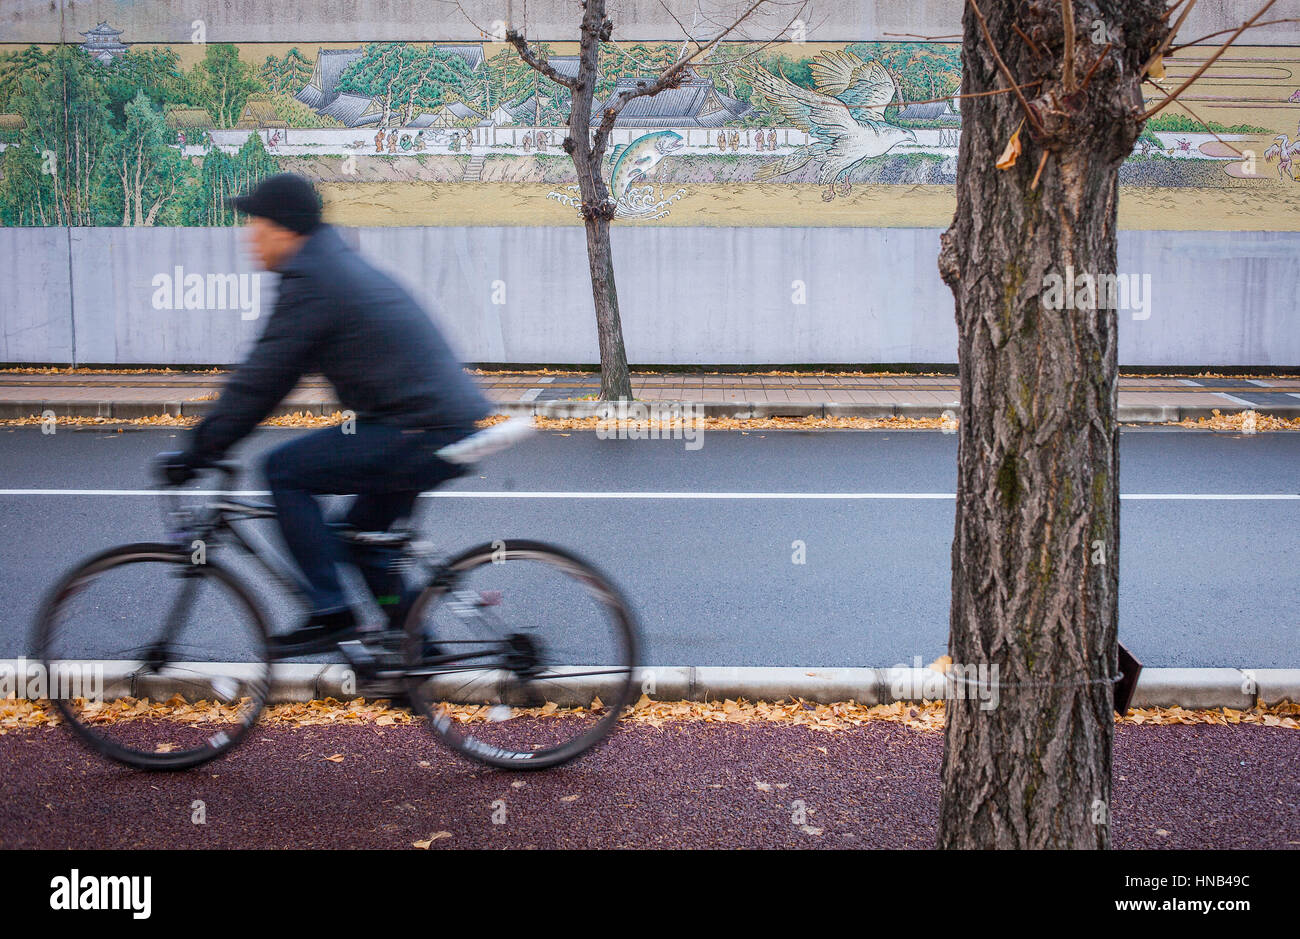 Biking, Mural of Hiroshima Detention House, Hiroshima, Japan - Stock Image